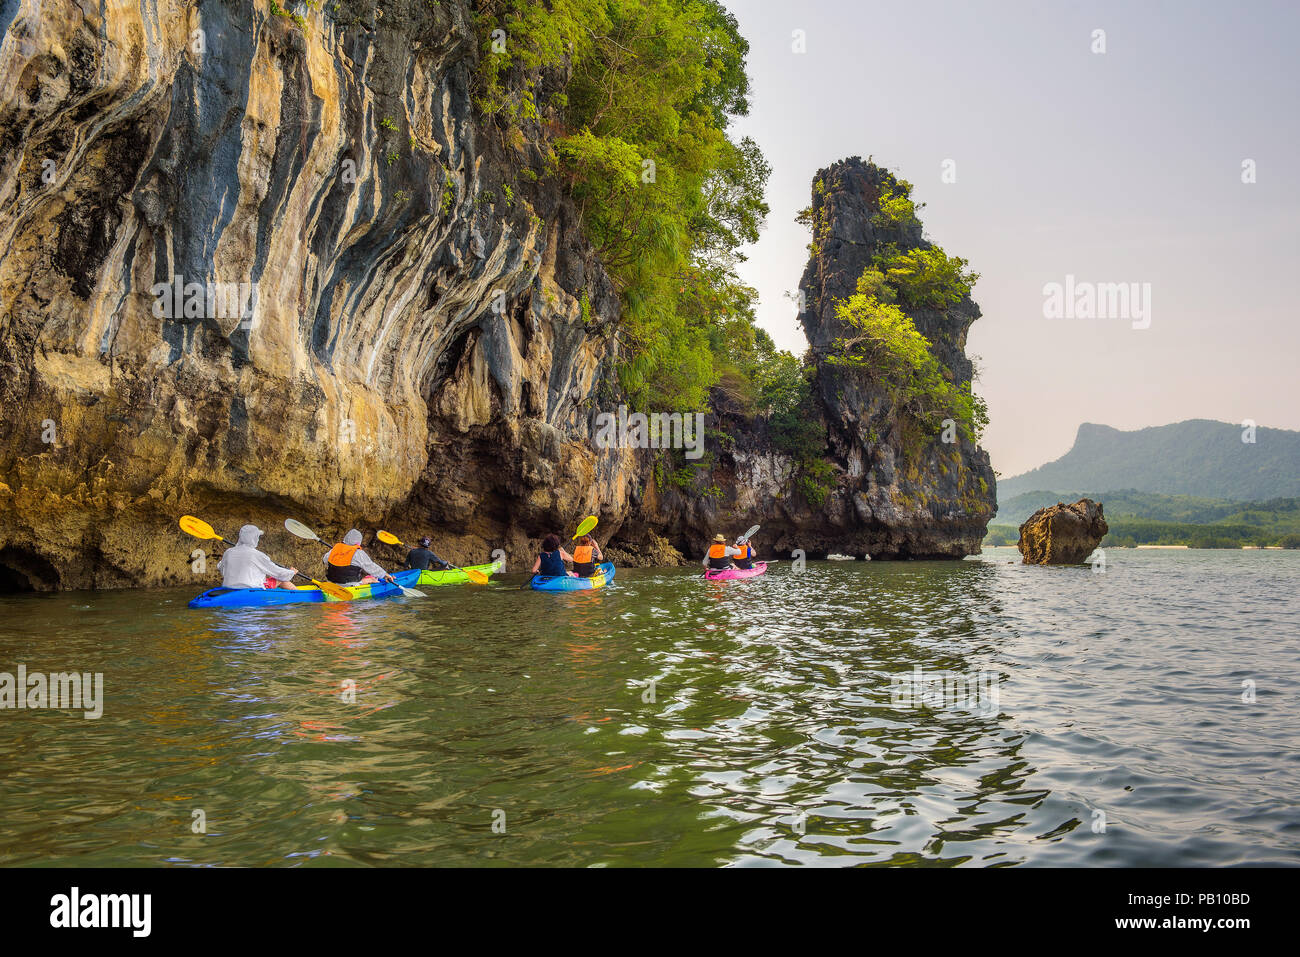 Kayaking into mangrove jungle of Krabi, Thailand - Stock Image